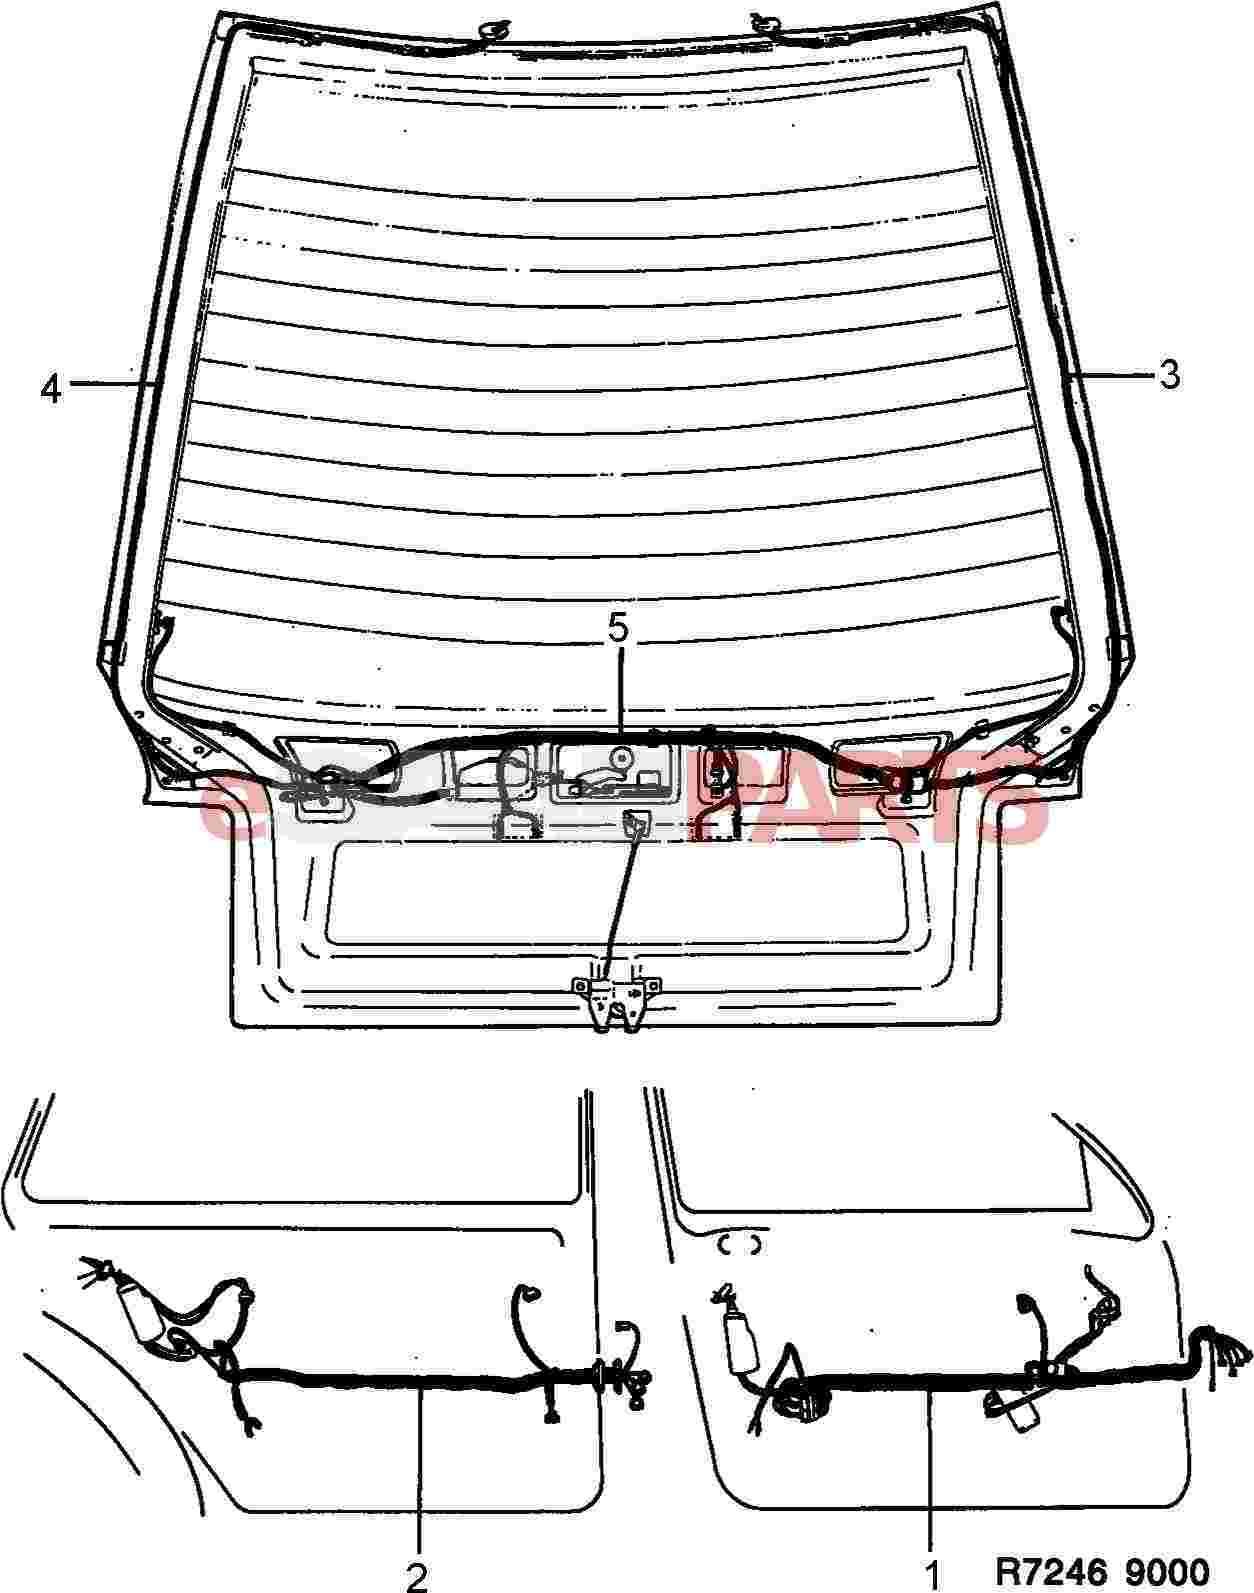 Scion Tc Clutch Diagram